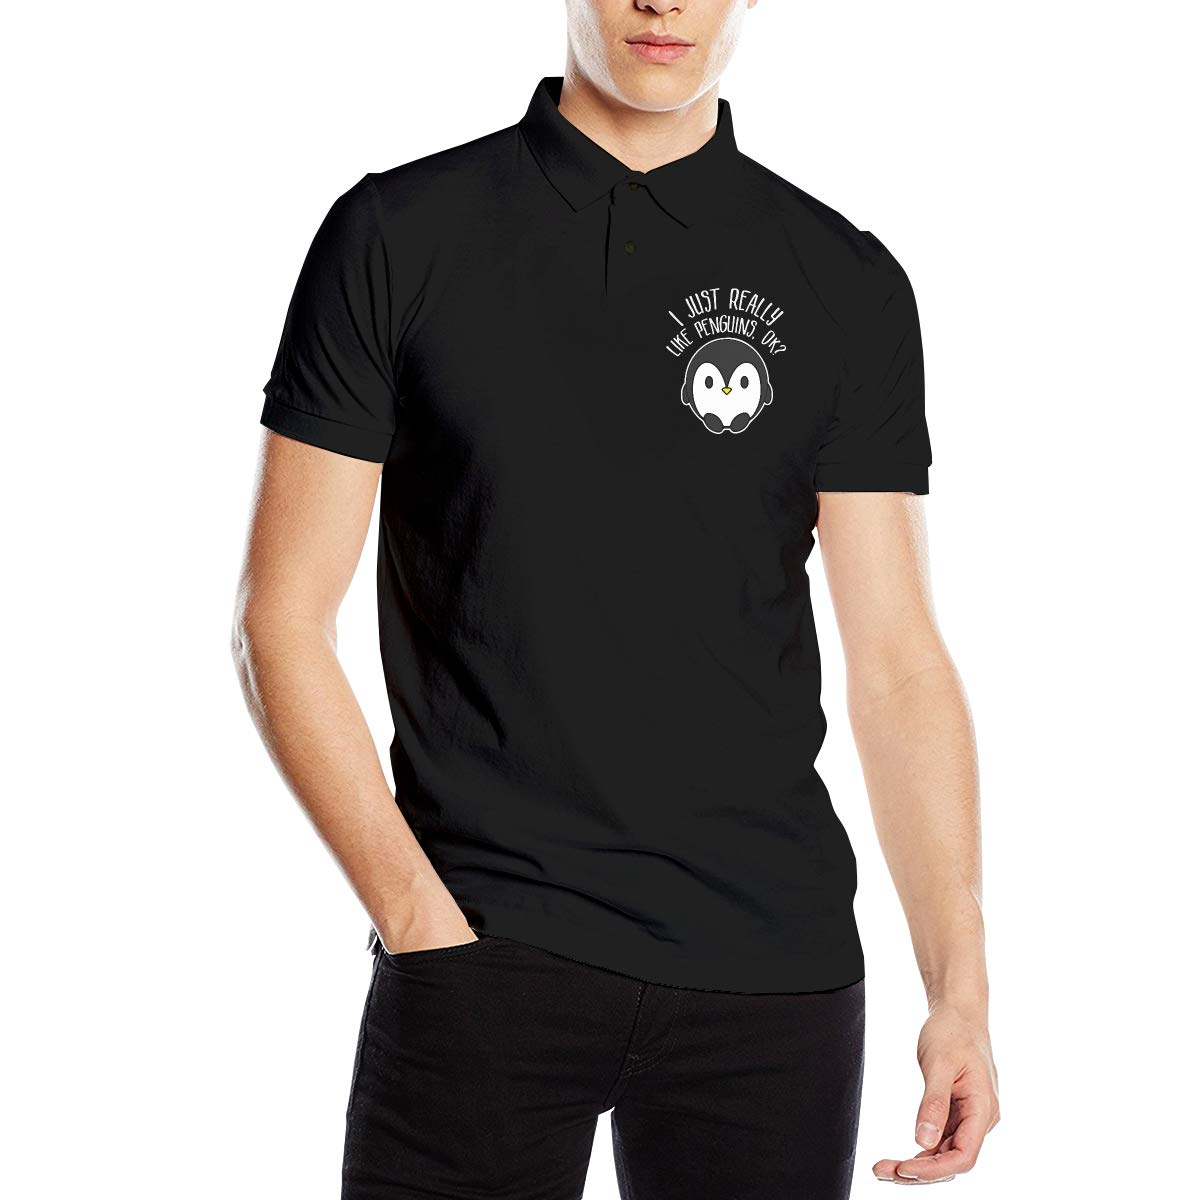 POJing-Q74 I Just Really Like Penguins Ok Mens Basic Designed Short Sleeve Polo T-Shirt